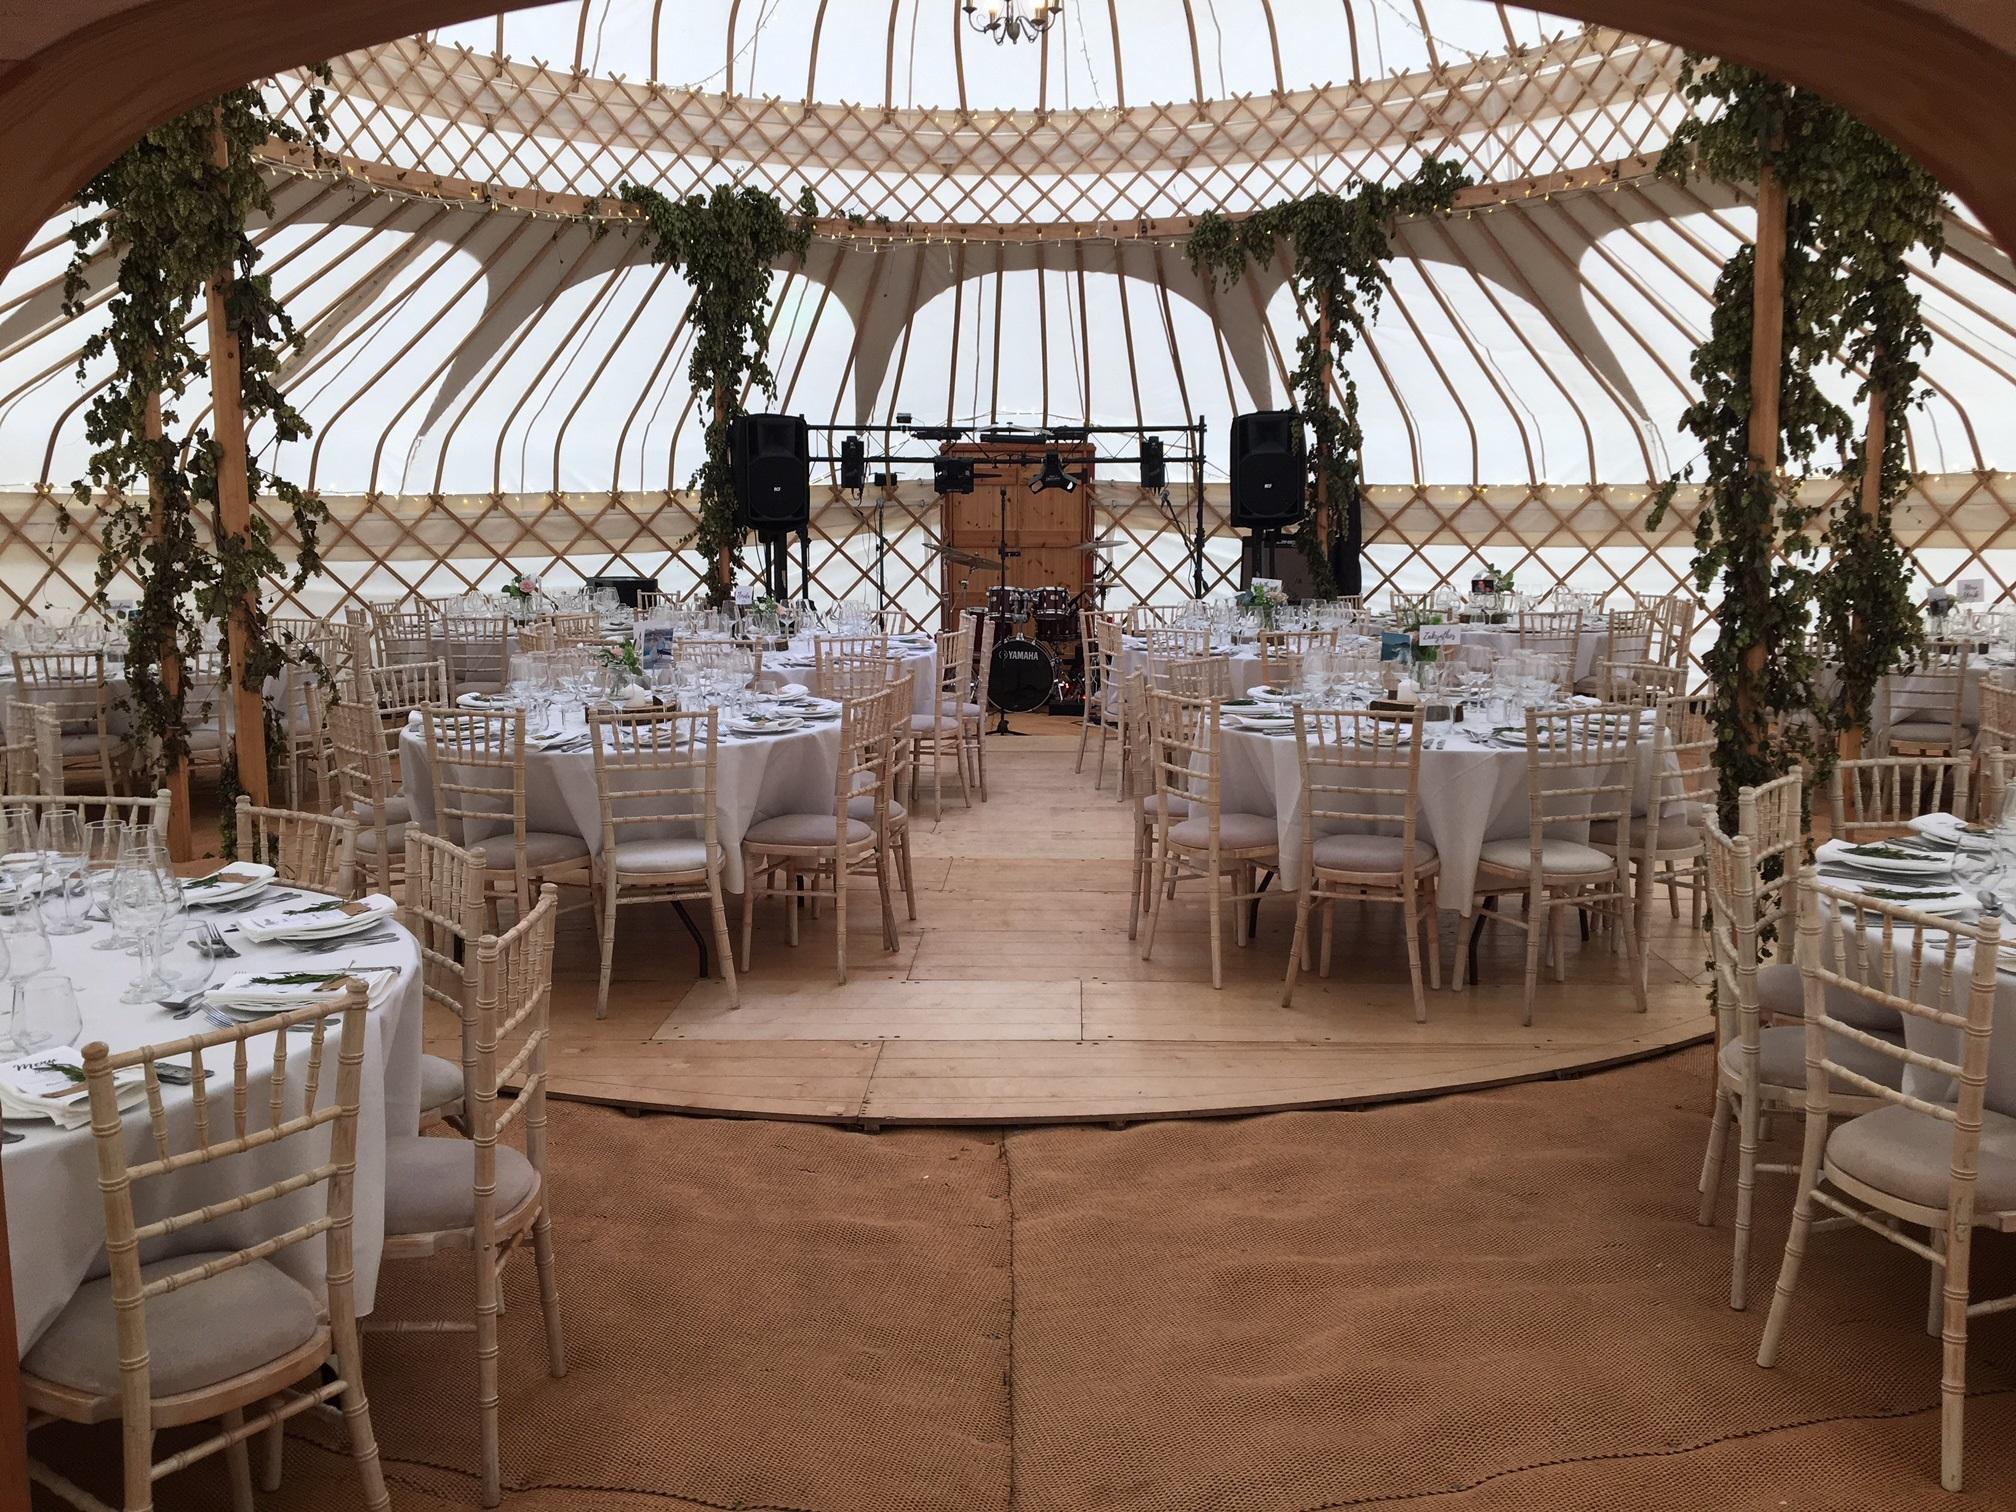 Yurts by the Yurt Maker